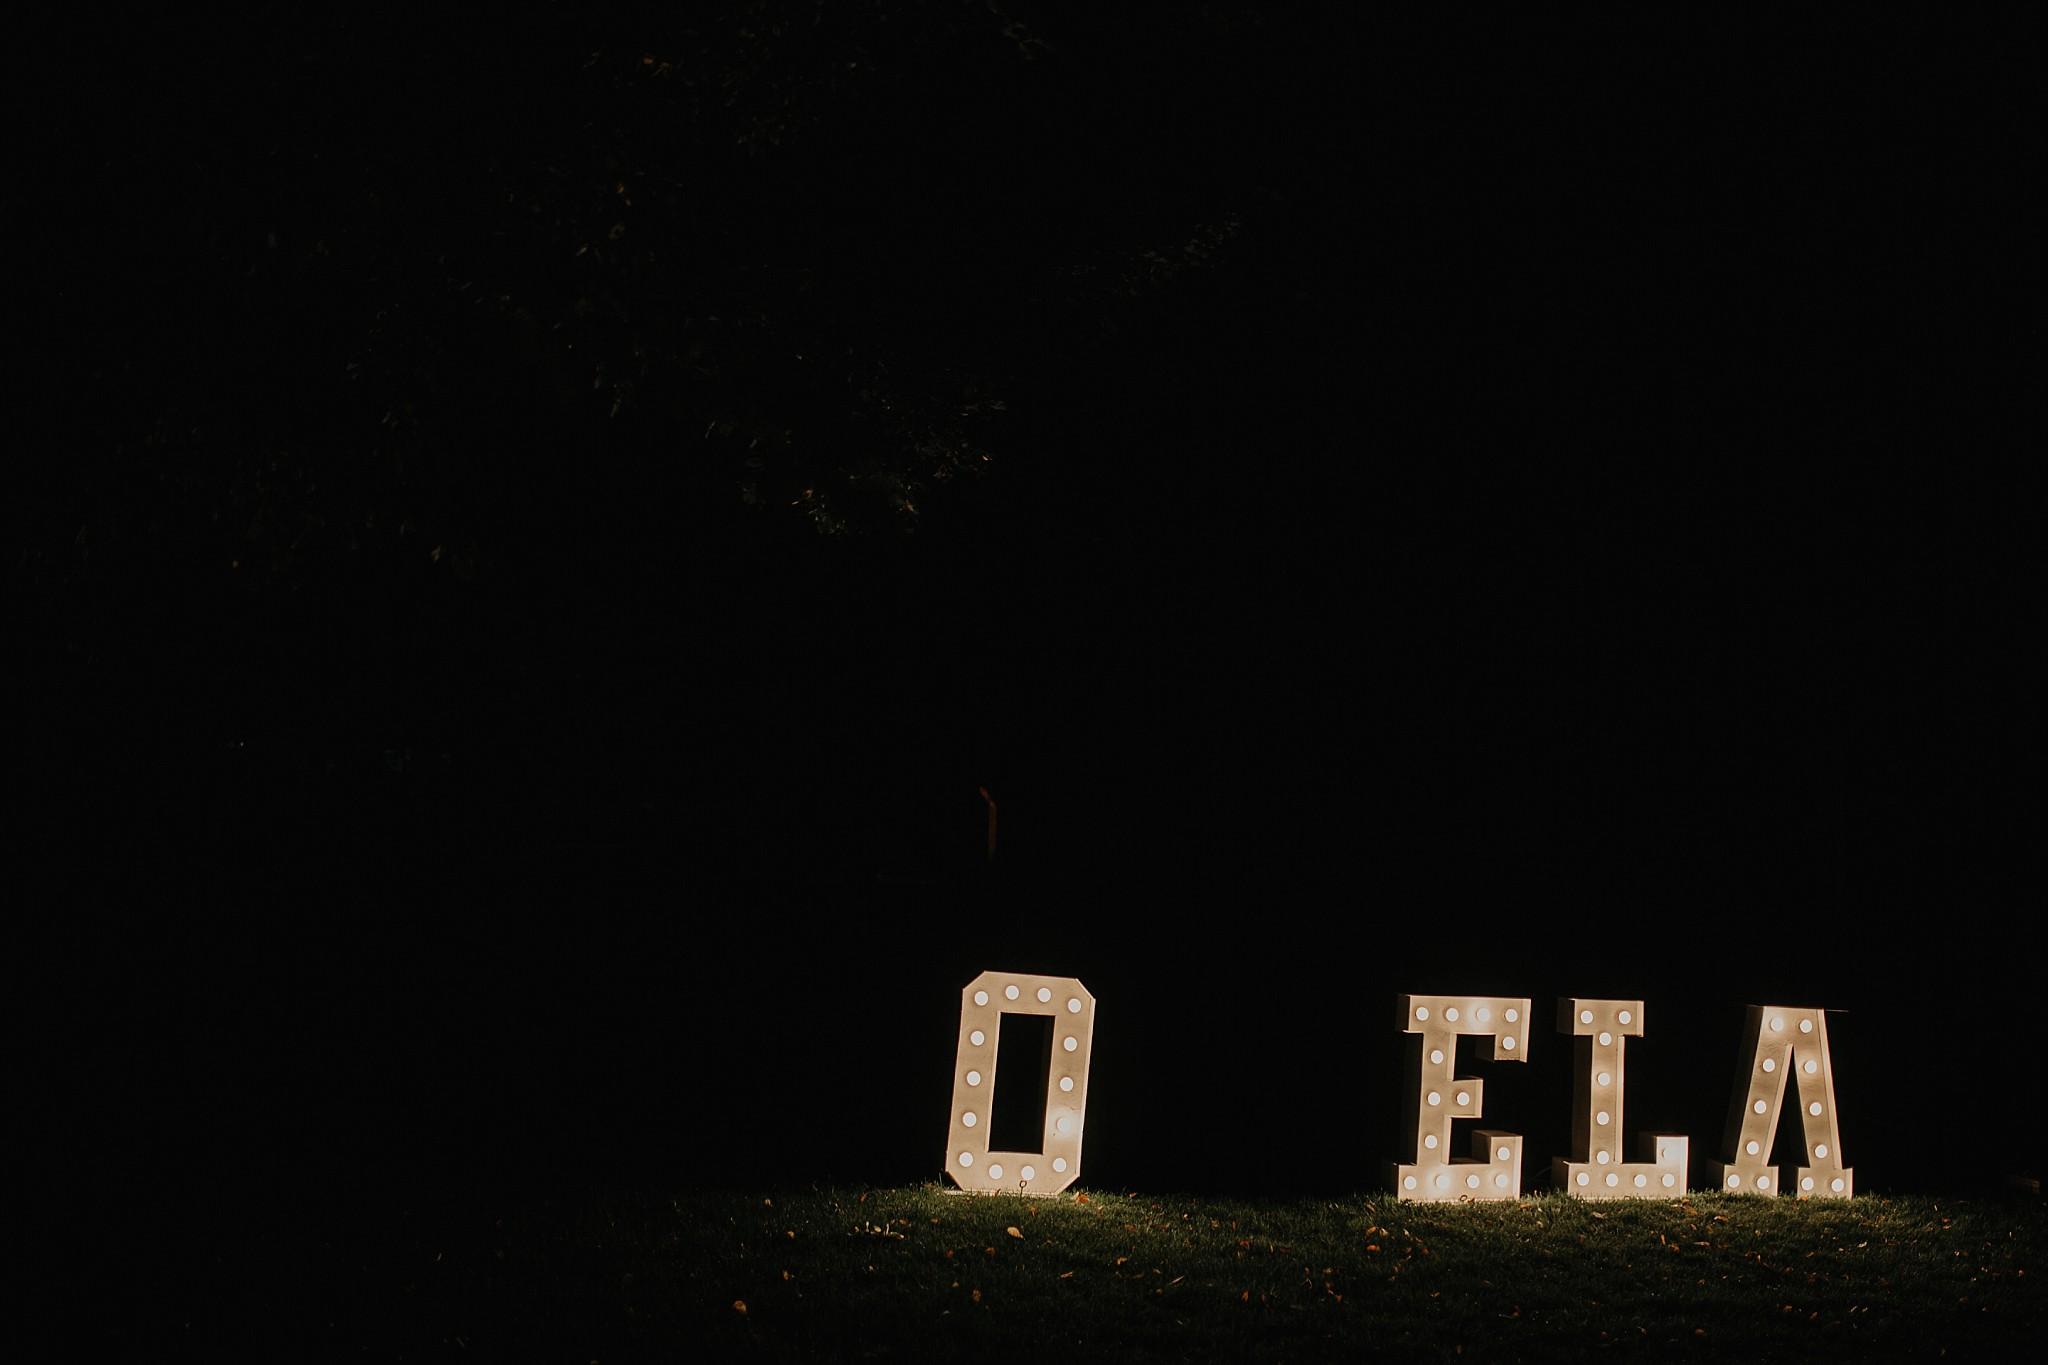 fotograf poznan wesele dobra truskawka piekne wesele pod poznaniem wesele w dobrej truskawce piekna para mloda slub marzen slub koronawirus slub listopad wesele koronawirus 249